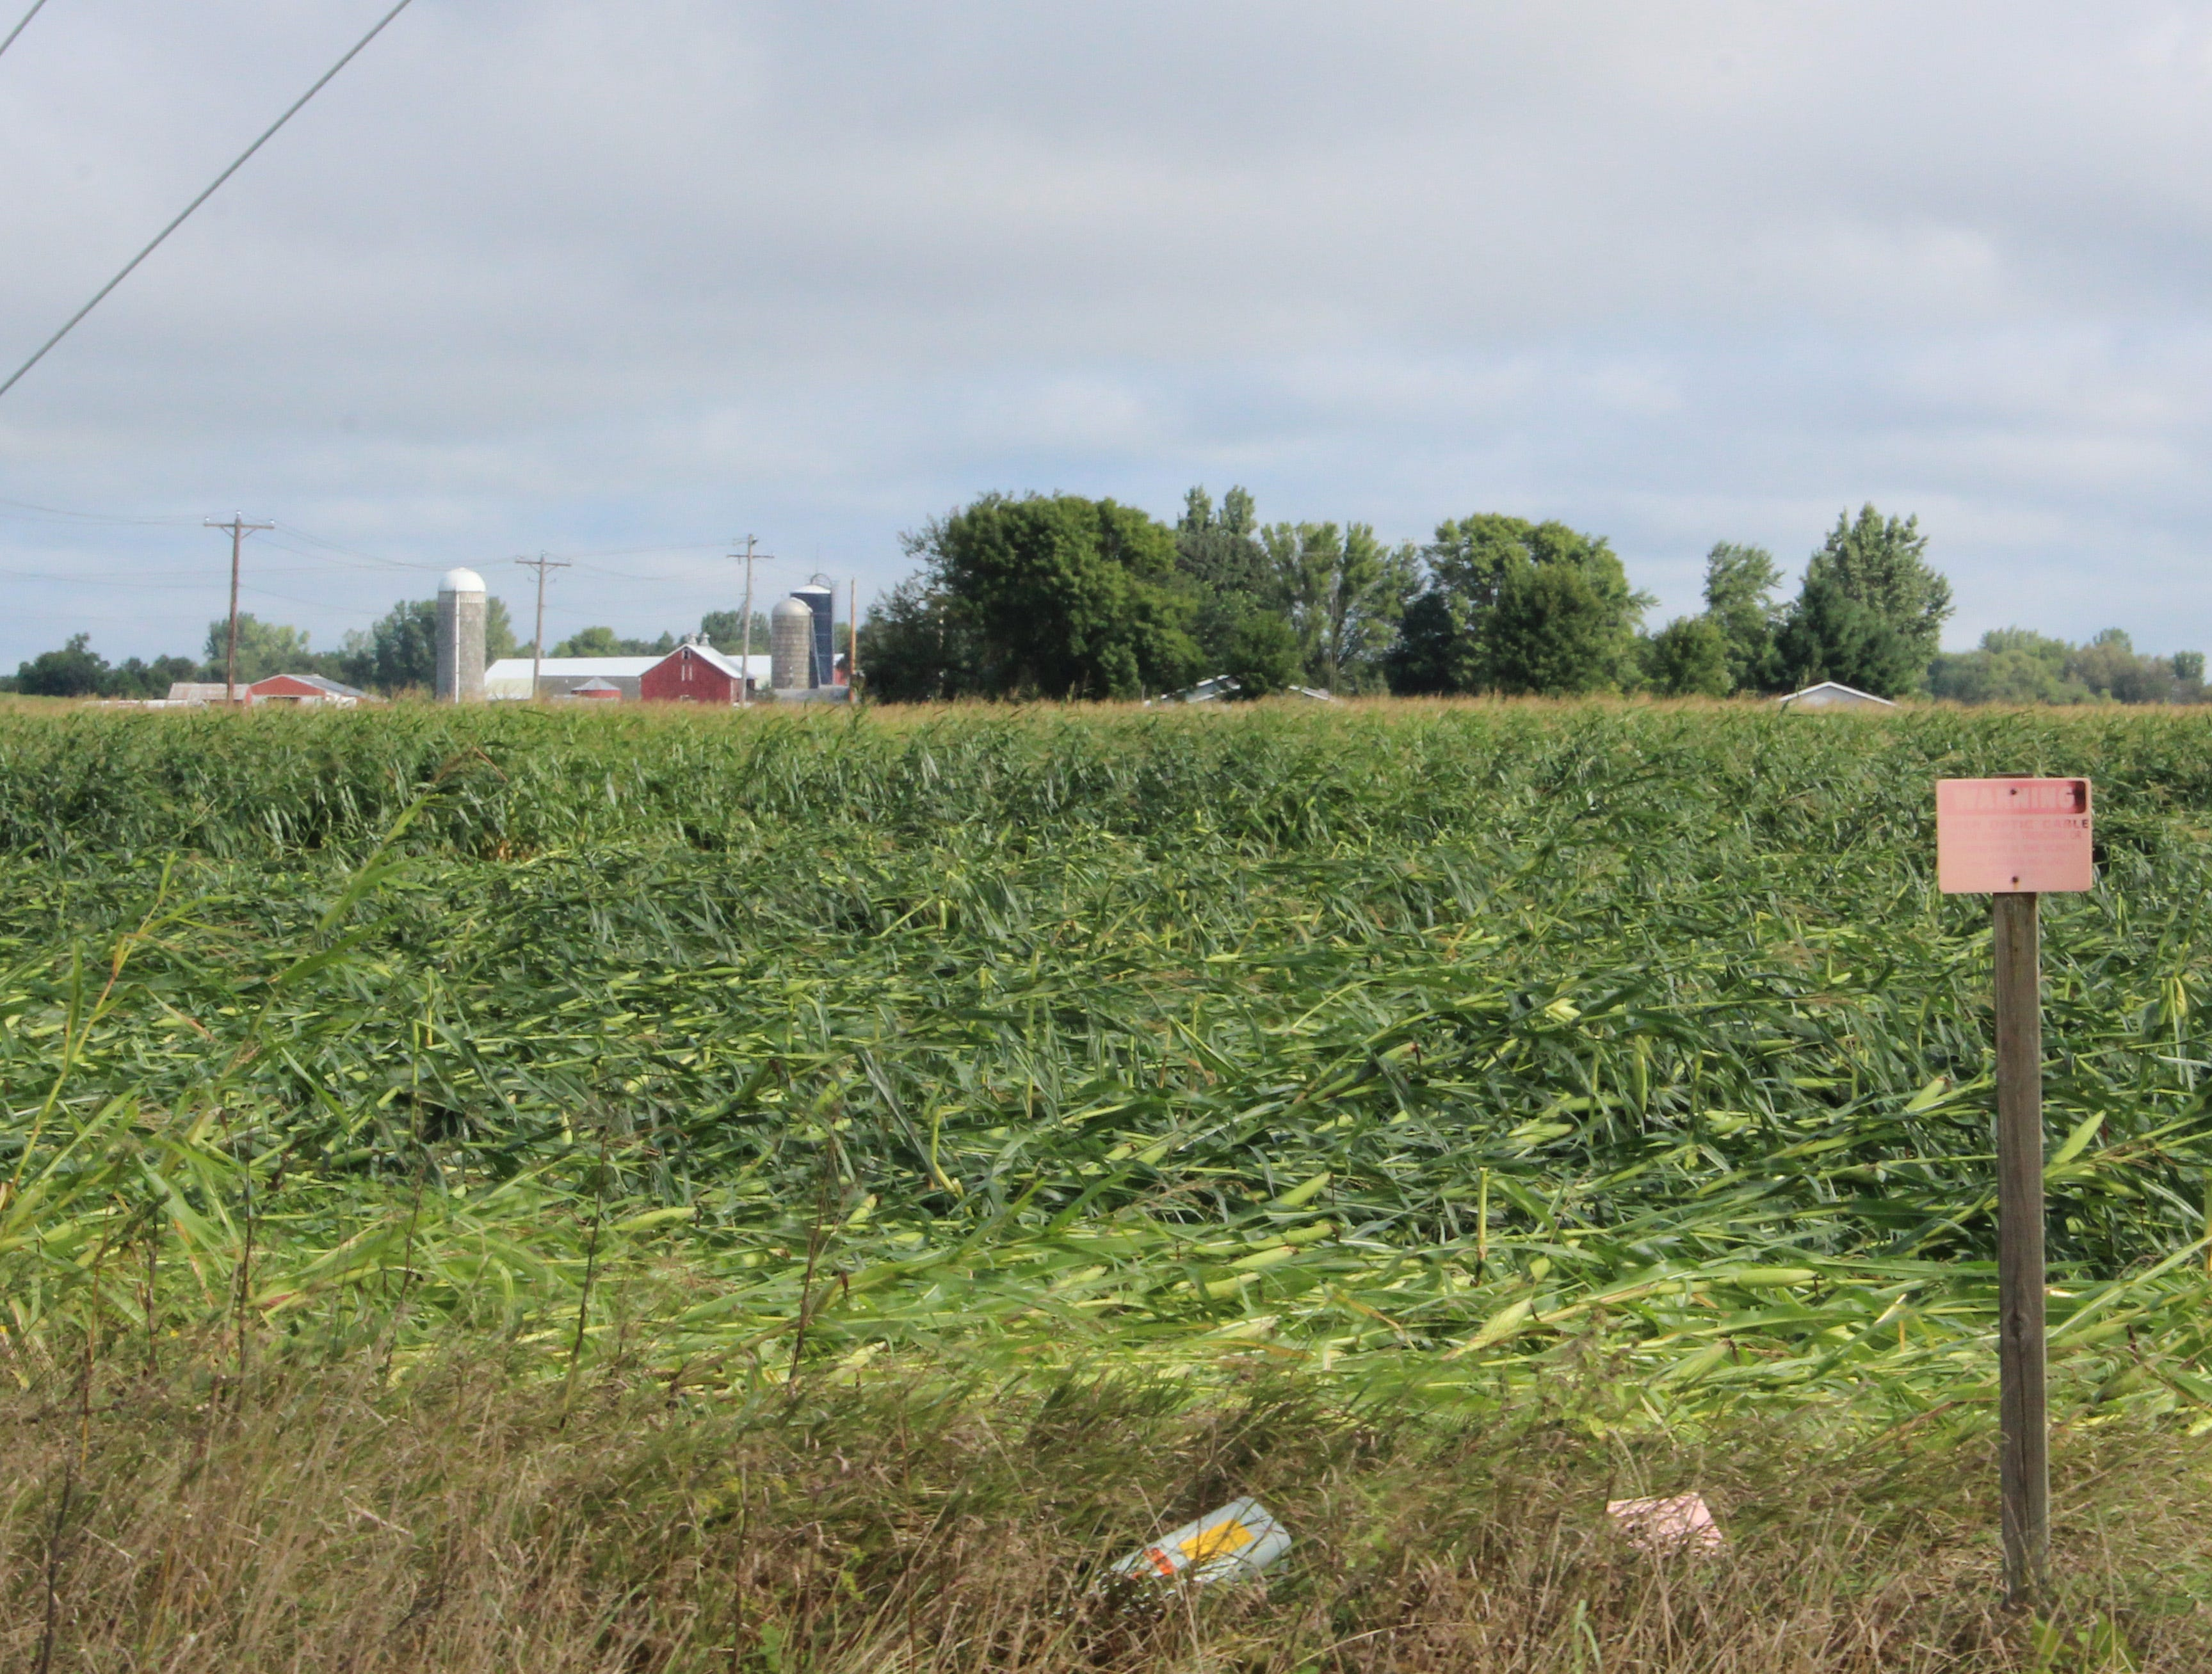 Damaging winds flattened this field of corn along Cattaraugus Road near Waupun.